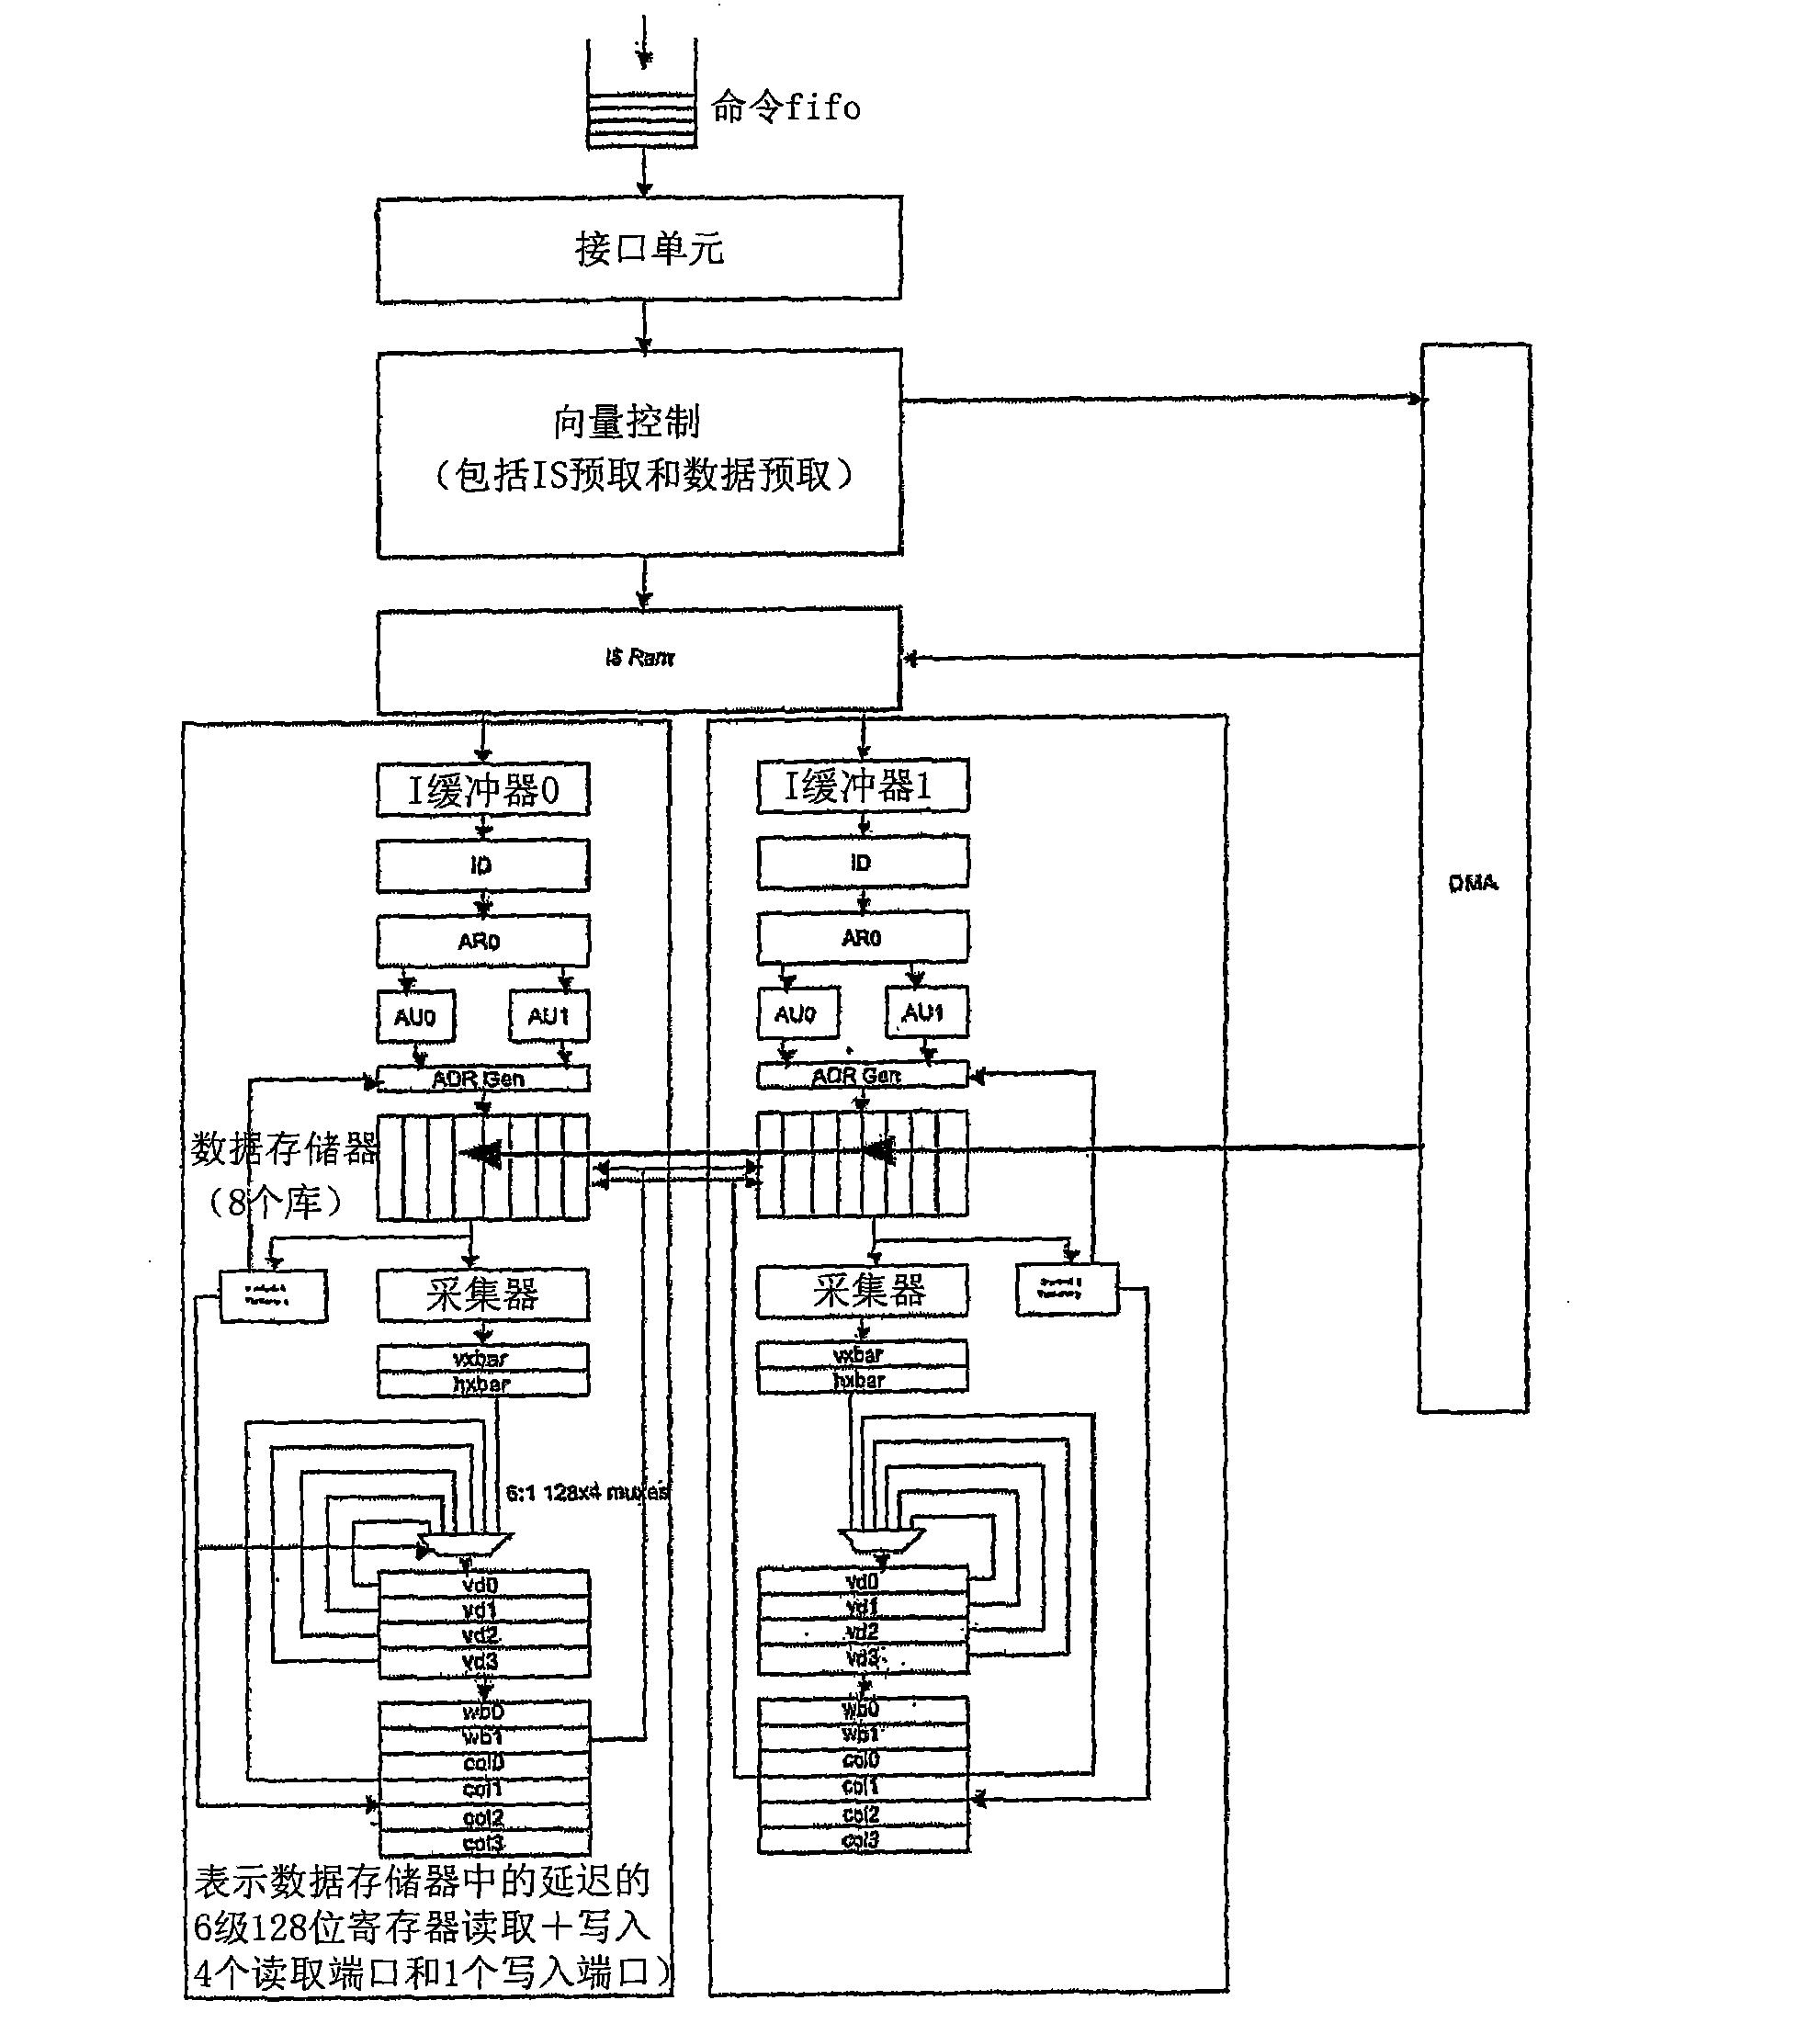 Großzügig Wiremold Kabelkanal System Ideen - Schaltplan Serie ...